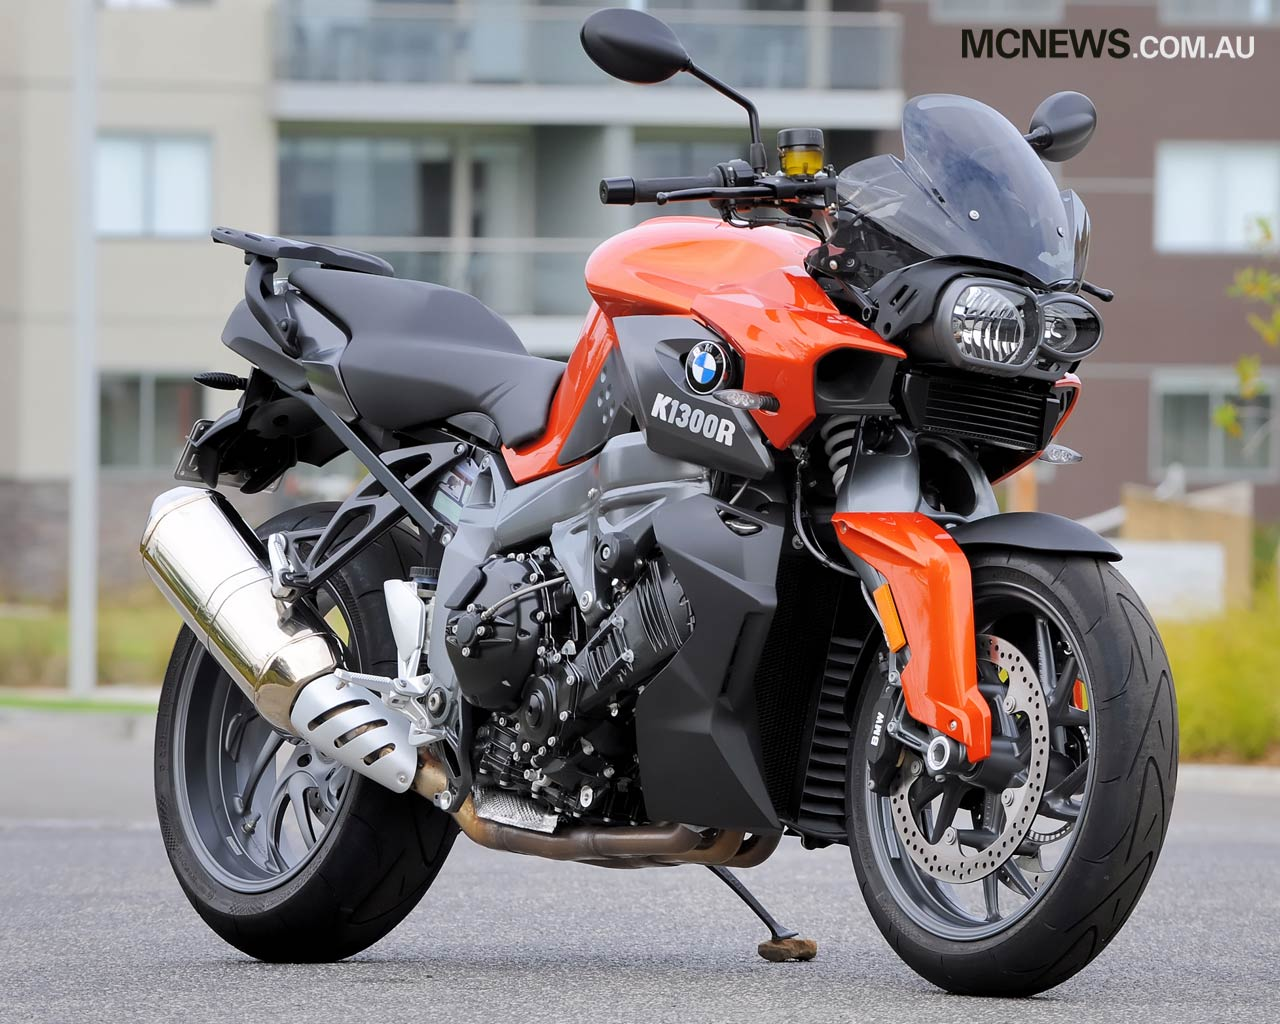 bmw k1300r bikes super moto and sexy girls. Black Bedroom Furniture Sets. Home Design Ideas